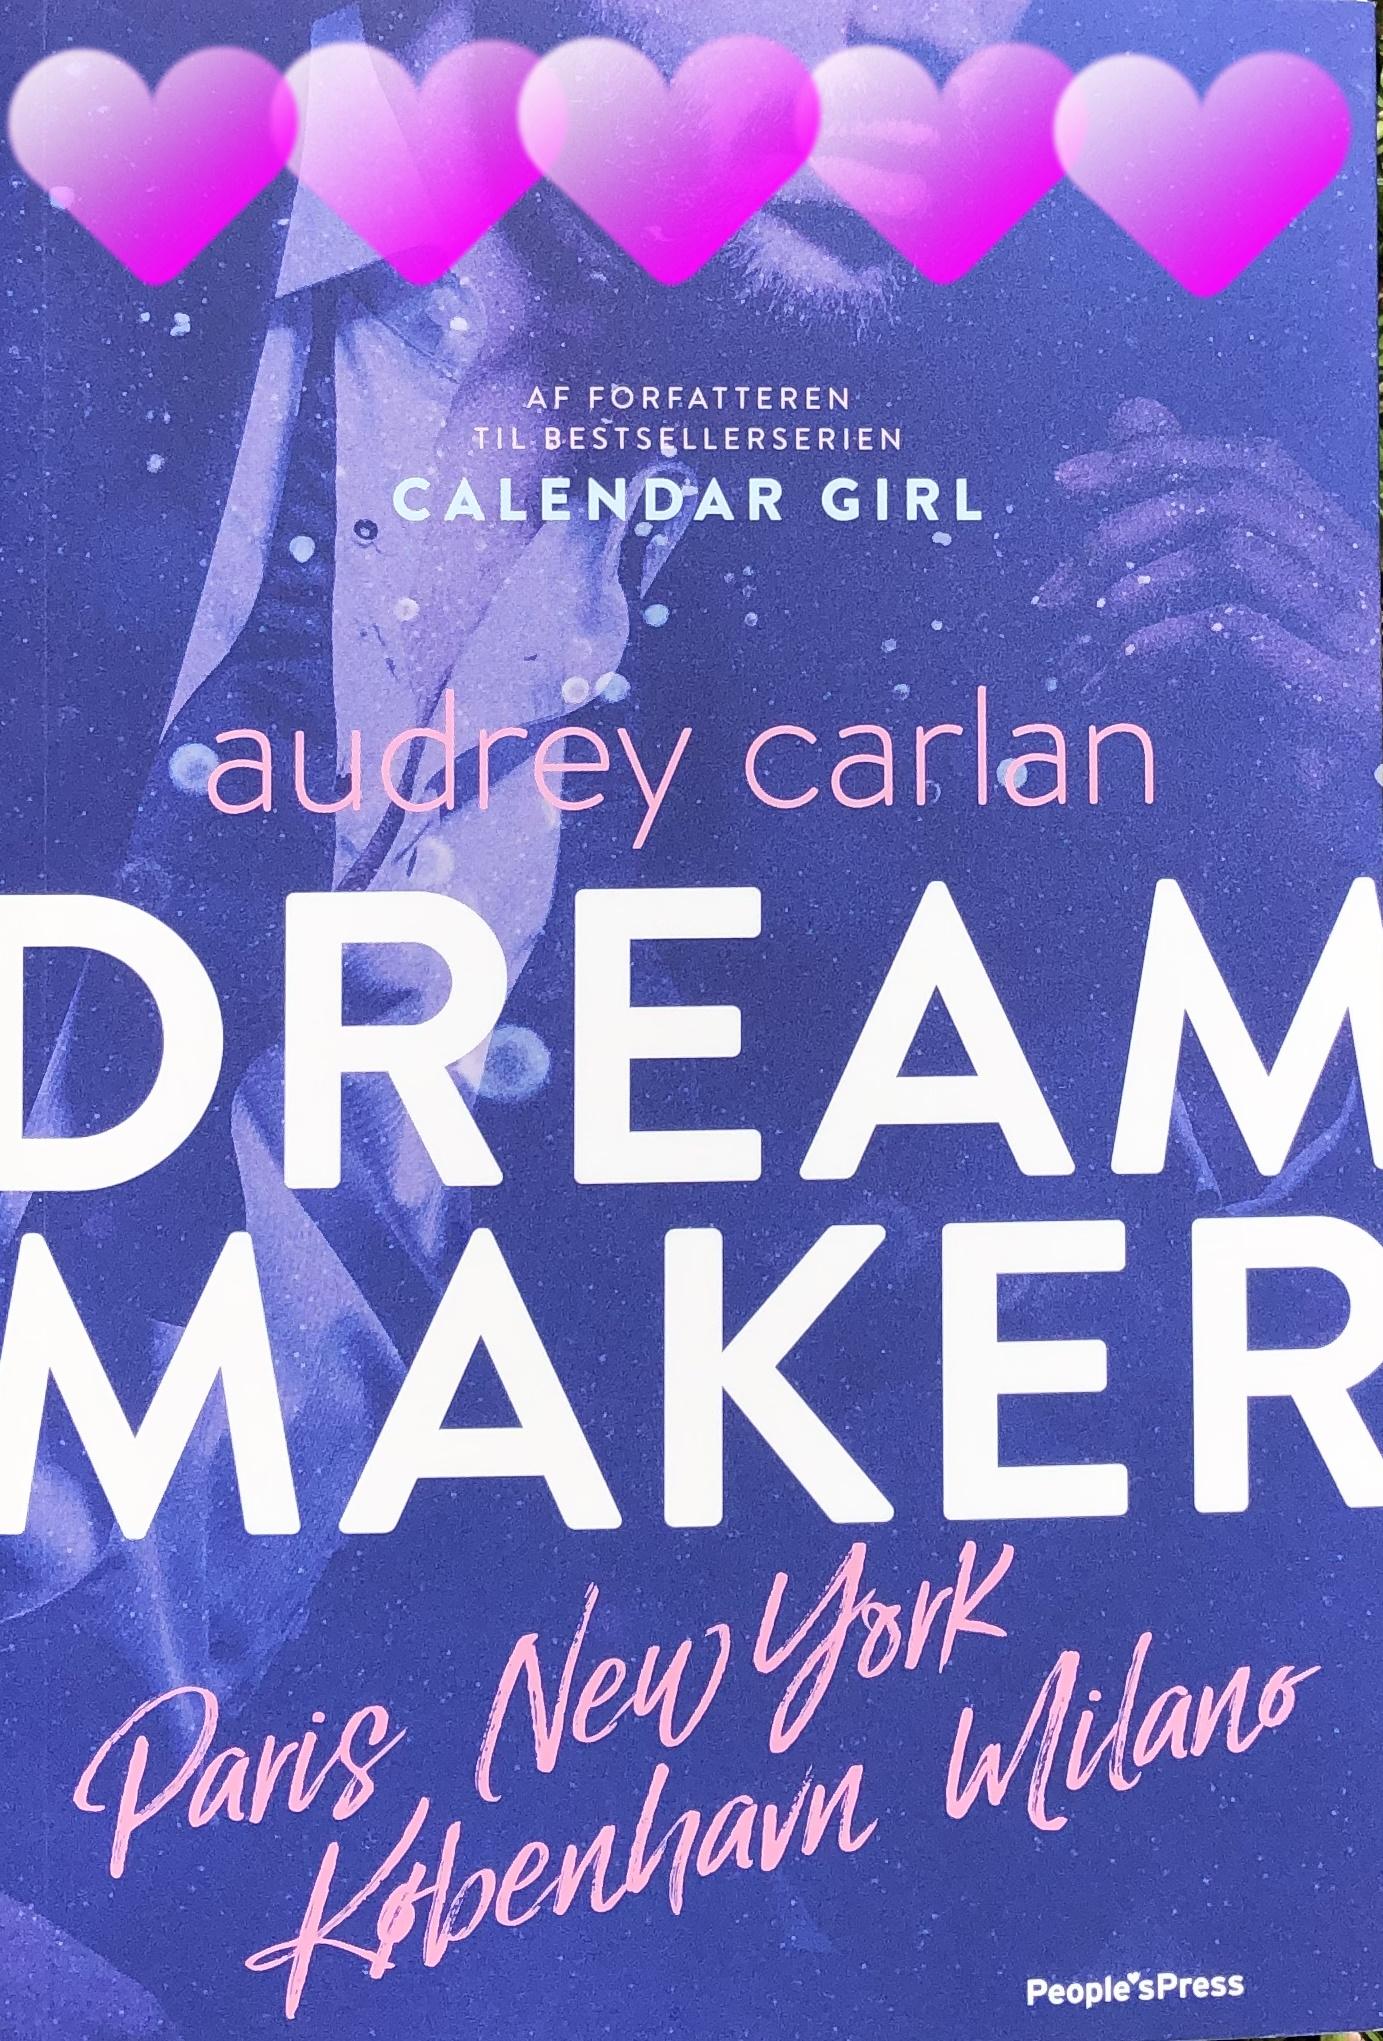 Dream Maker, Dream maker af Audrey Carlan, Audrey Carlan, krummeskrummelurer.dk, Krummes Krummelurer, Krummeskrummelurer, Ellis parker, Money Maker, Love Maker, Anmeldereksemplar, Anmeldelse, Boganmeldelse, Boganmeldelse Dream Maker, Boganmeldelse Audrey Carlan, Anmeldereksemplar,